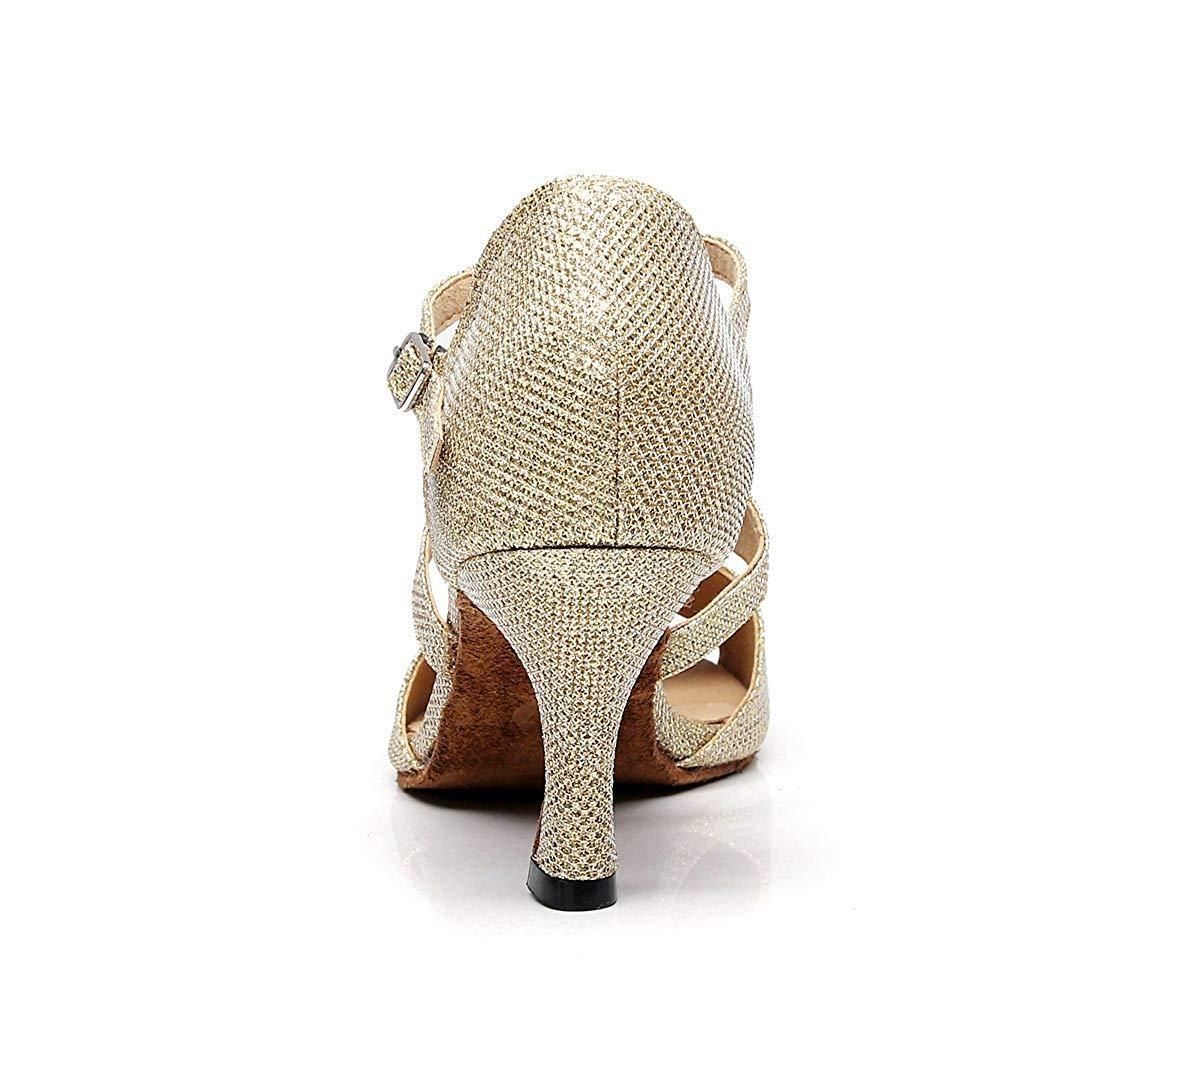 ZHRUI TJ7135 Damen Mädchen T-Strap Gold Glitter Salsa Latin Latin Latin Tanzen Sandalen UK 4 (Farbe   -, Größe   -) 20d667